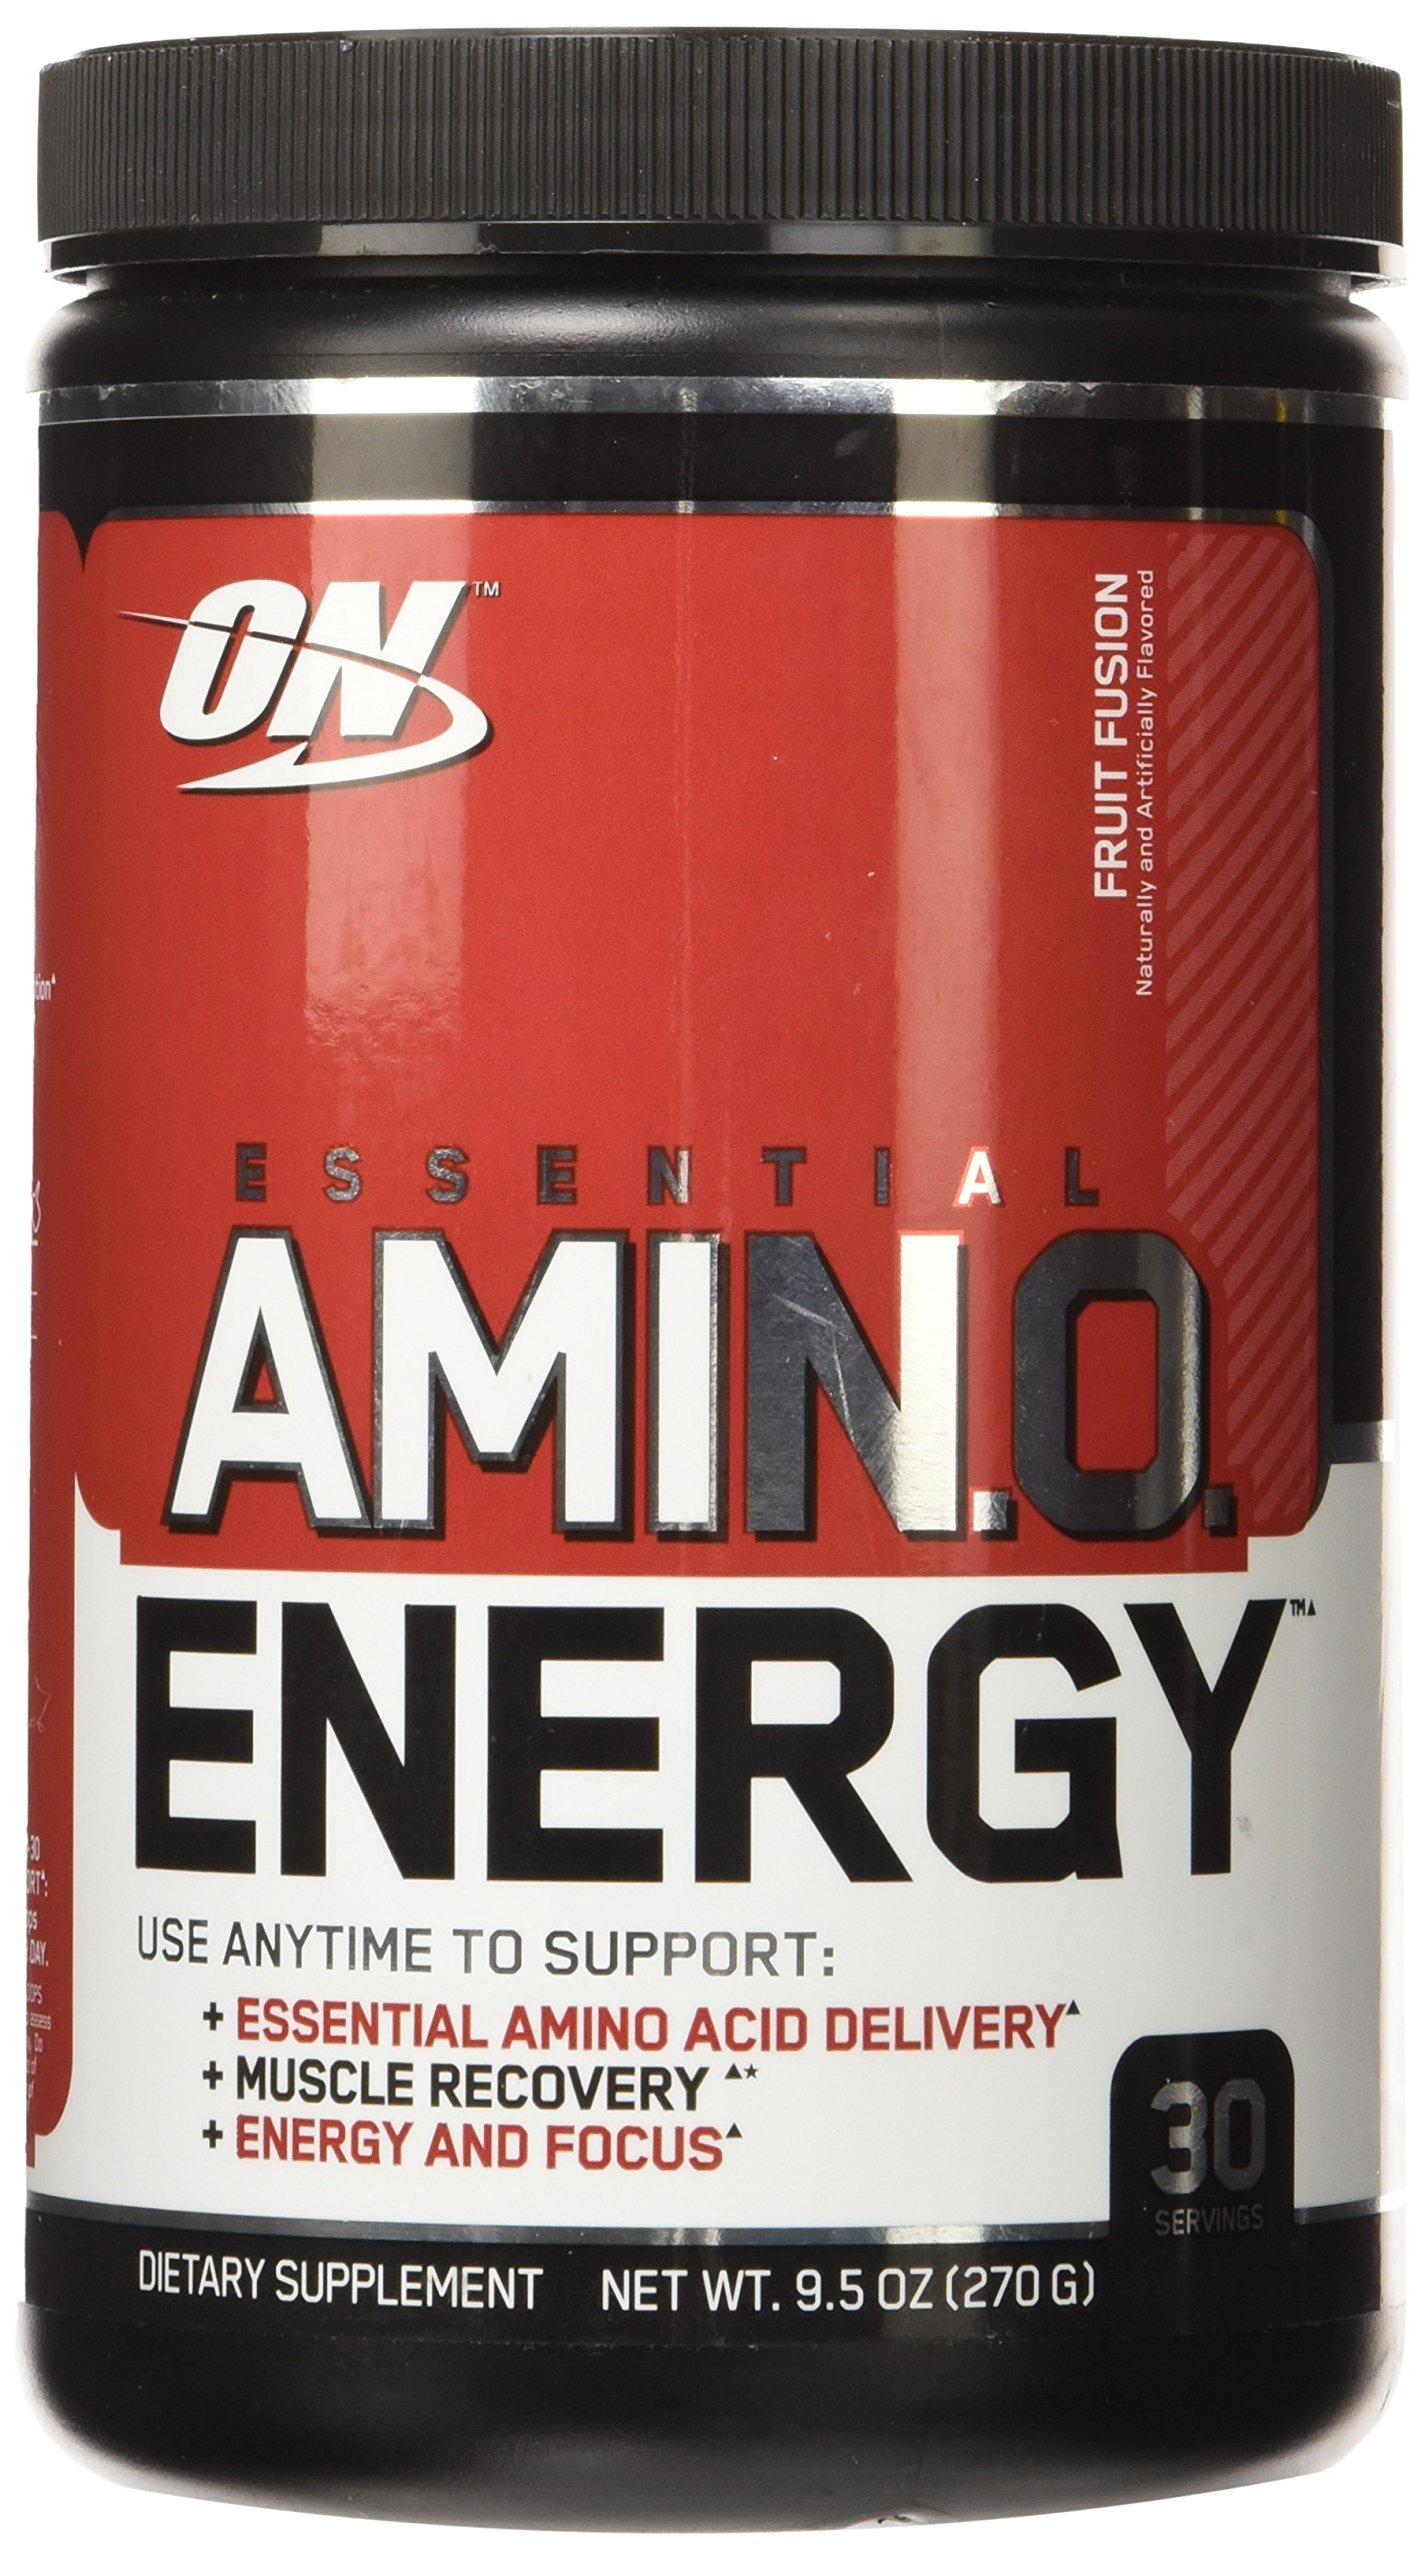 OPTIMUM NUTRITION ESSENTIAL AMINO ENERGY, Fruit Fusion, 30 Servings (Pack of 3)